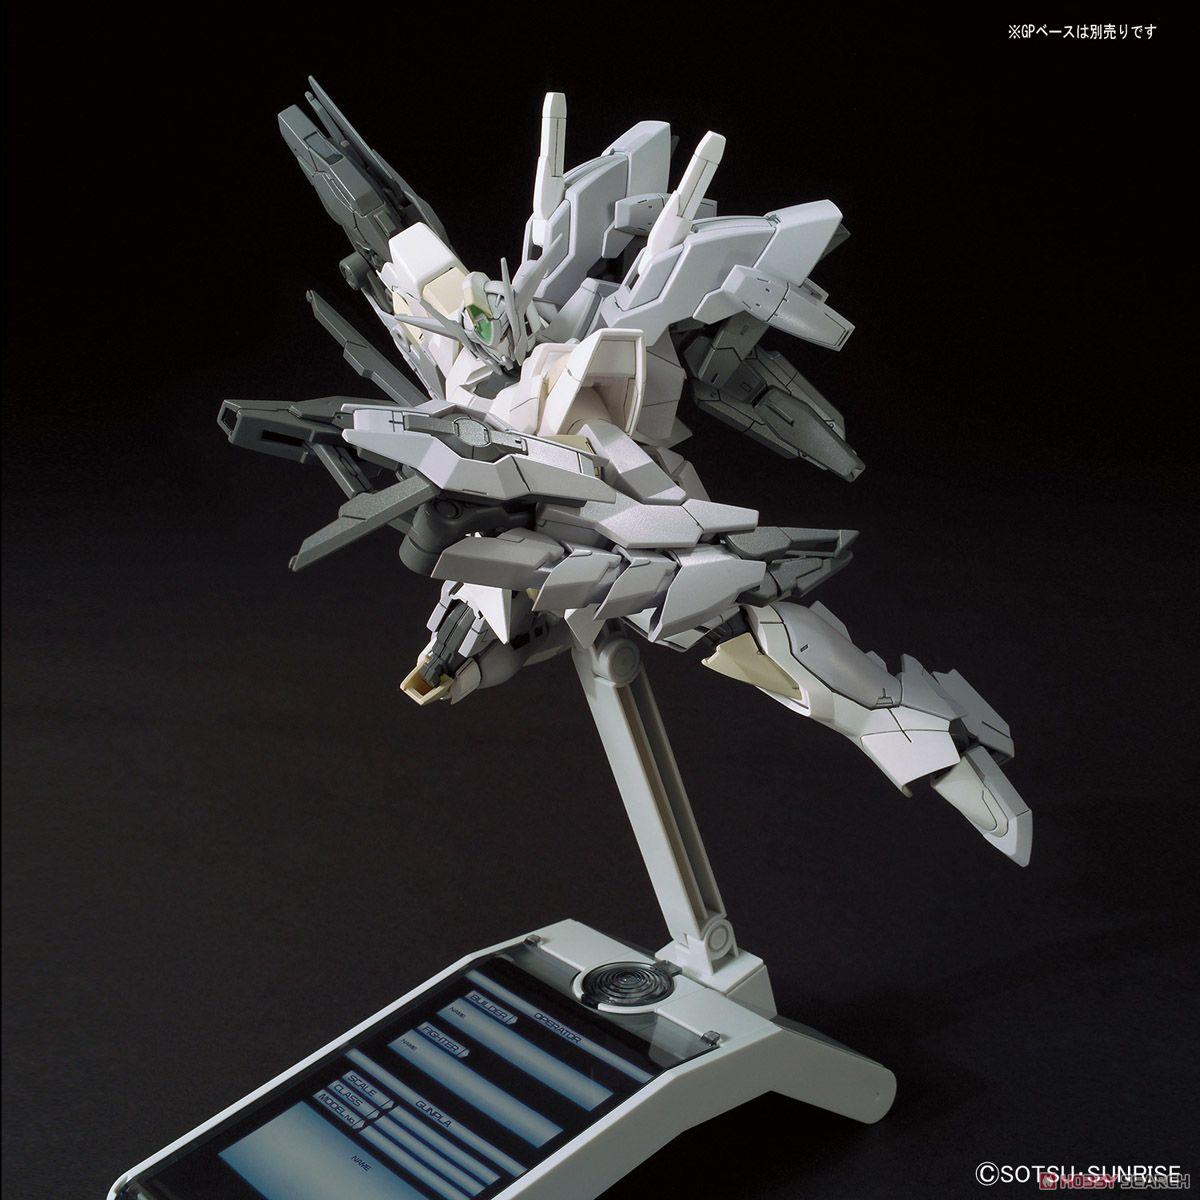 Reversible Gundam (HGBF) (Gundam Model Kits) Item picture6